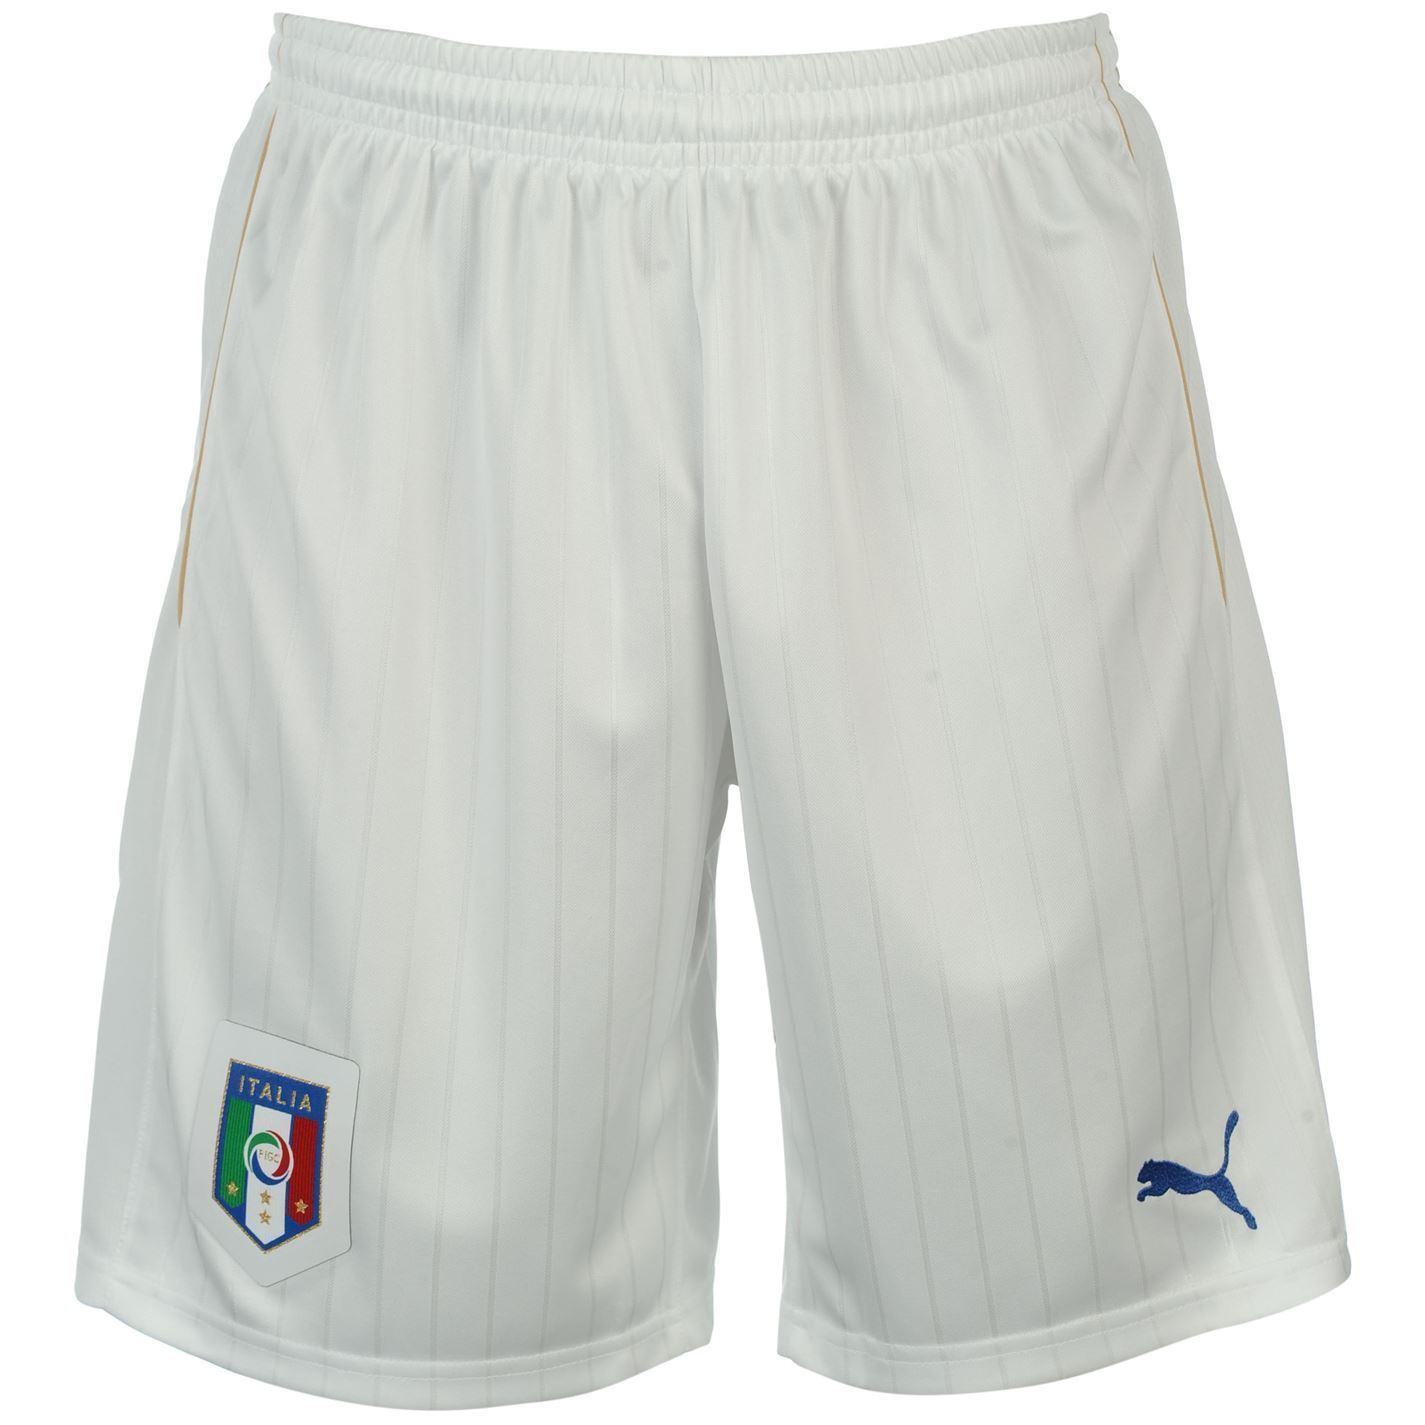 Puma  Home Shorts 2016 Mens White bluee Football Soccer Short